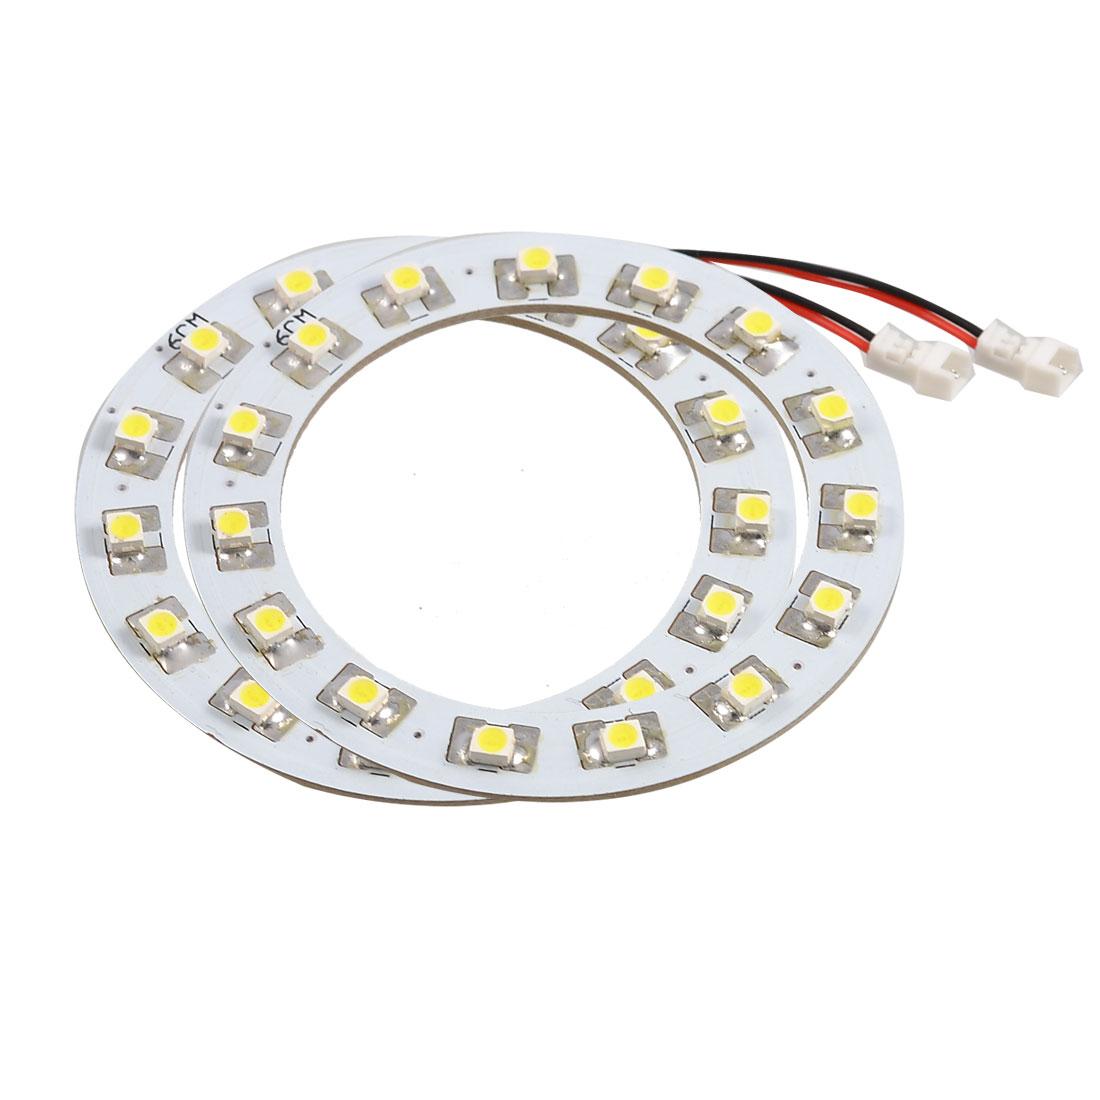 60mm White 15 SMD LEDs Angel Eyes Ring Car Headlight Light 2 Pcs